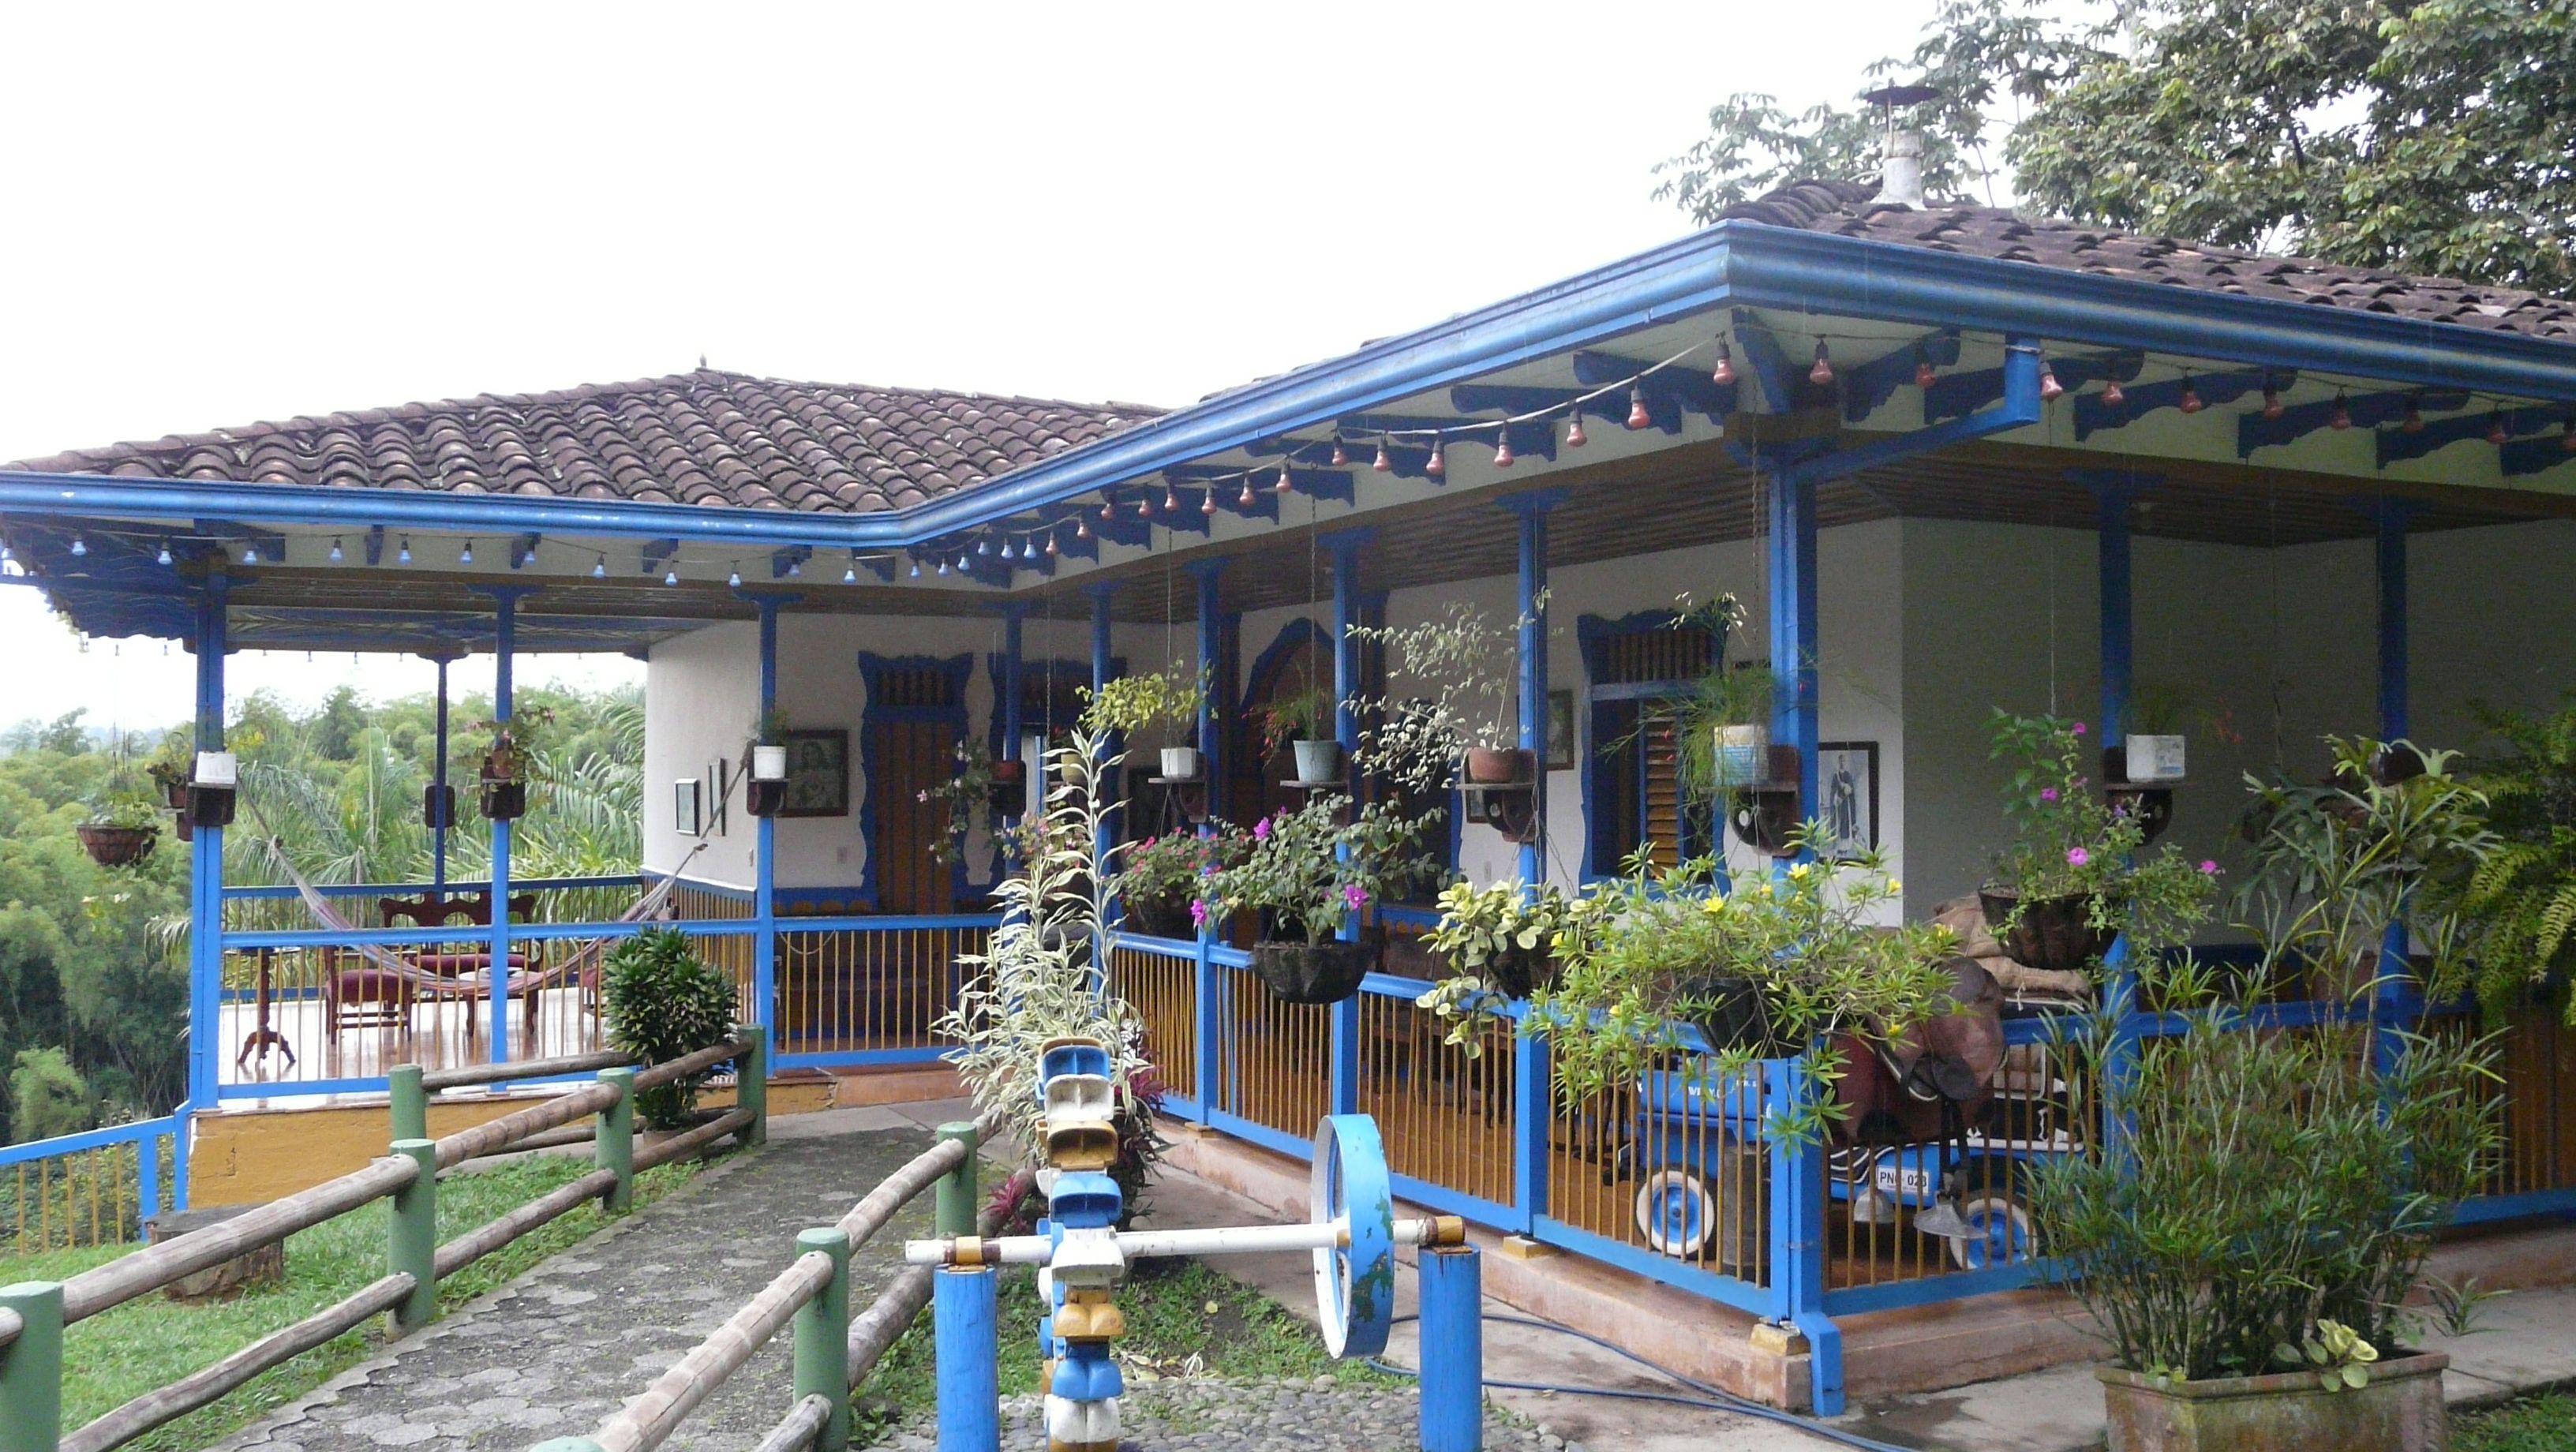 Finca zona cafetera decoracion pinterest zona for Arreglos de casas viejas